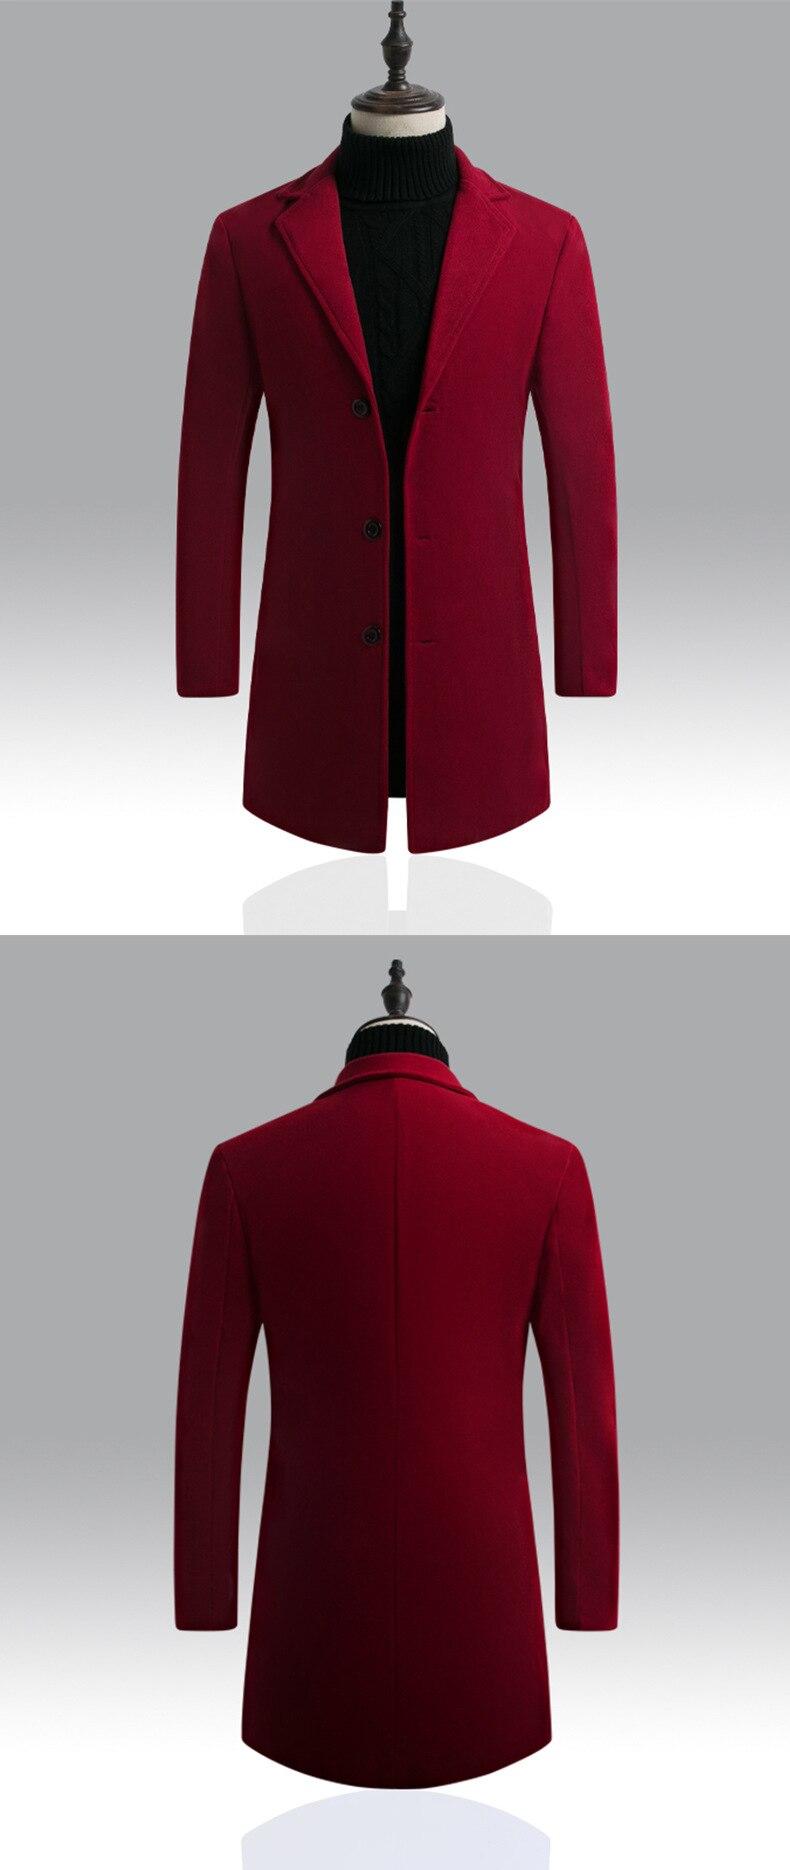 casaco preto vermelho cinza feminino outerwear M-5XL